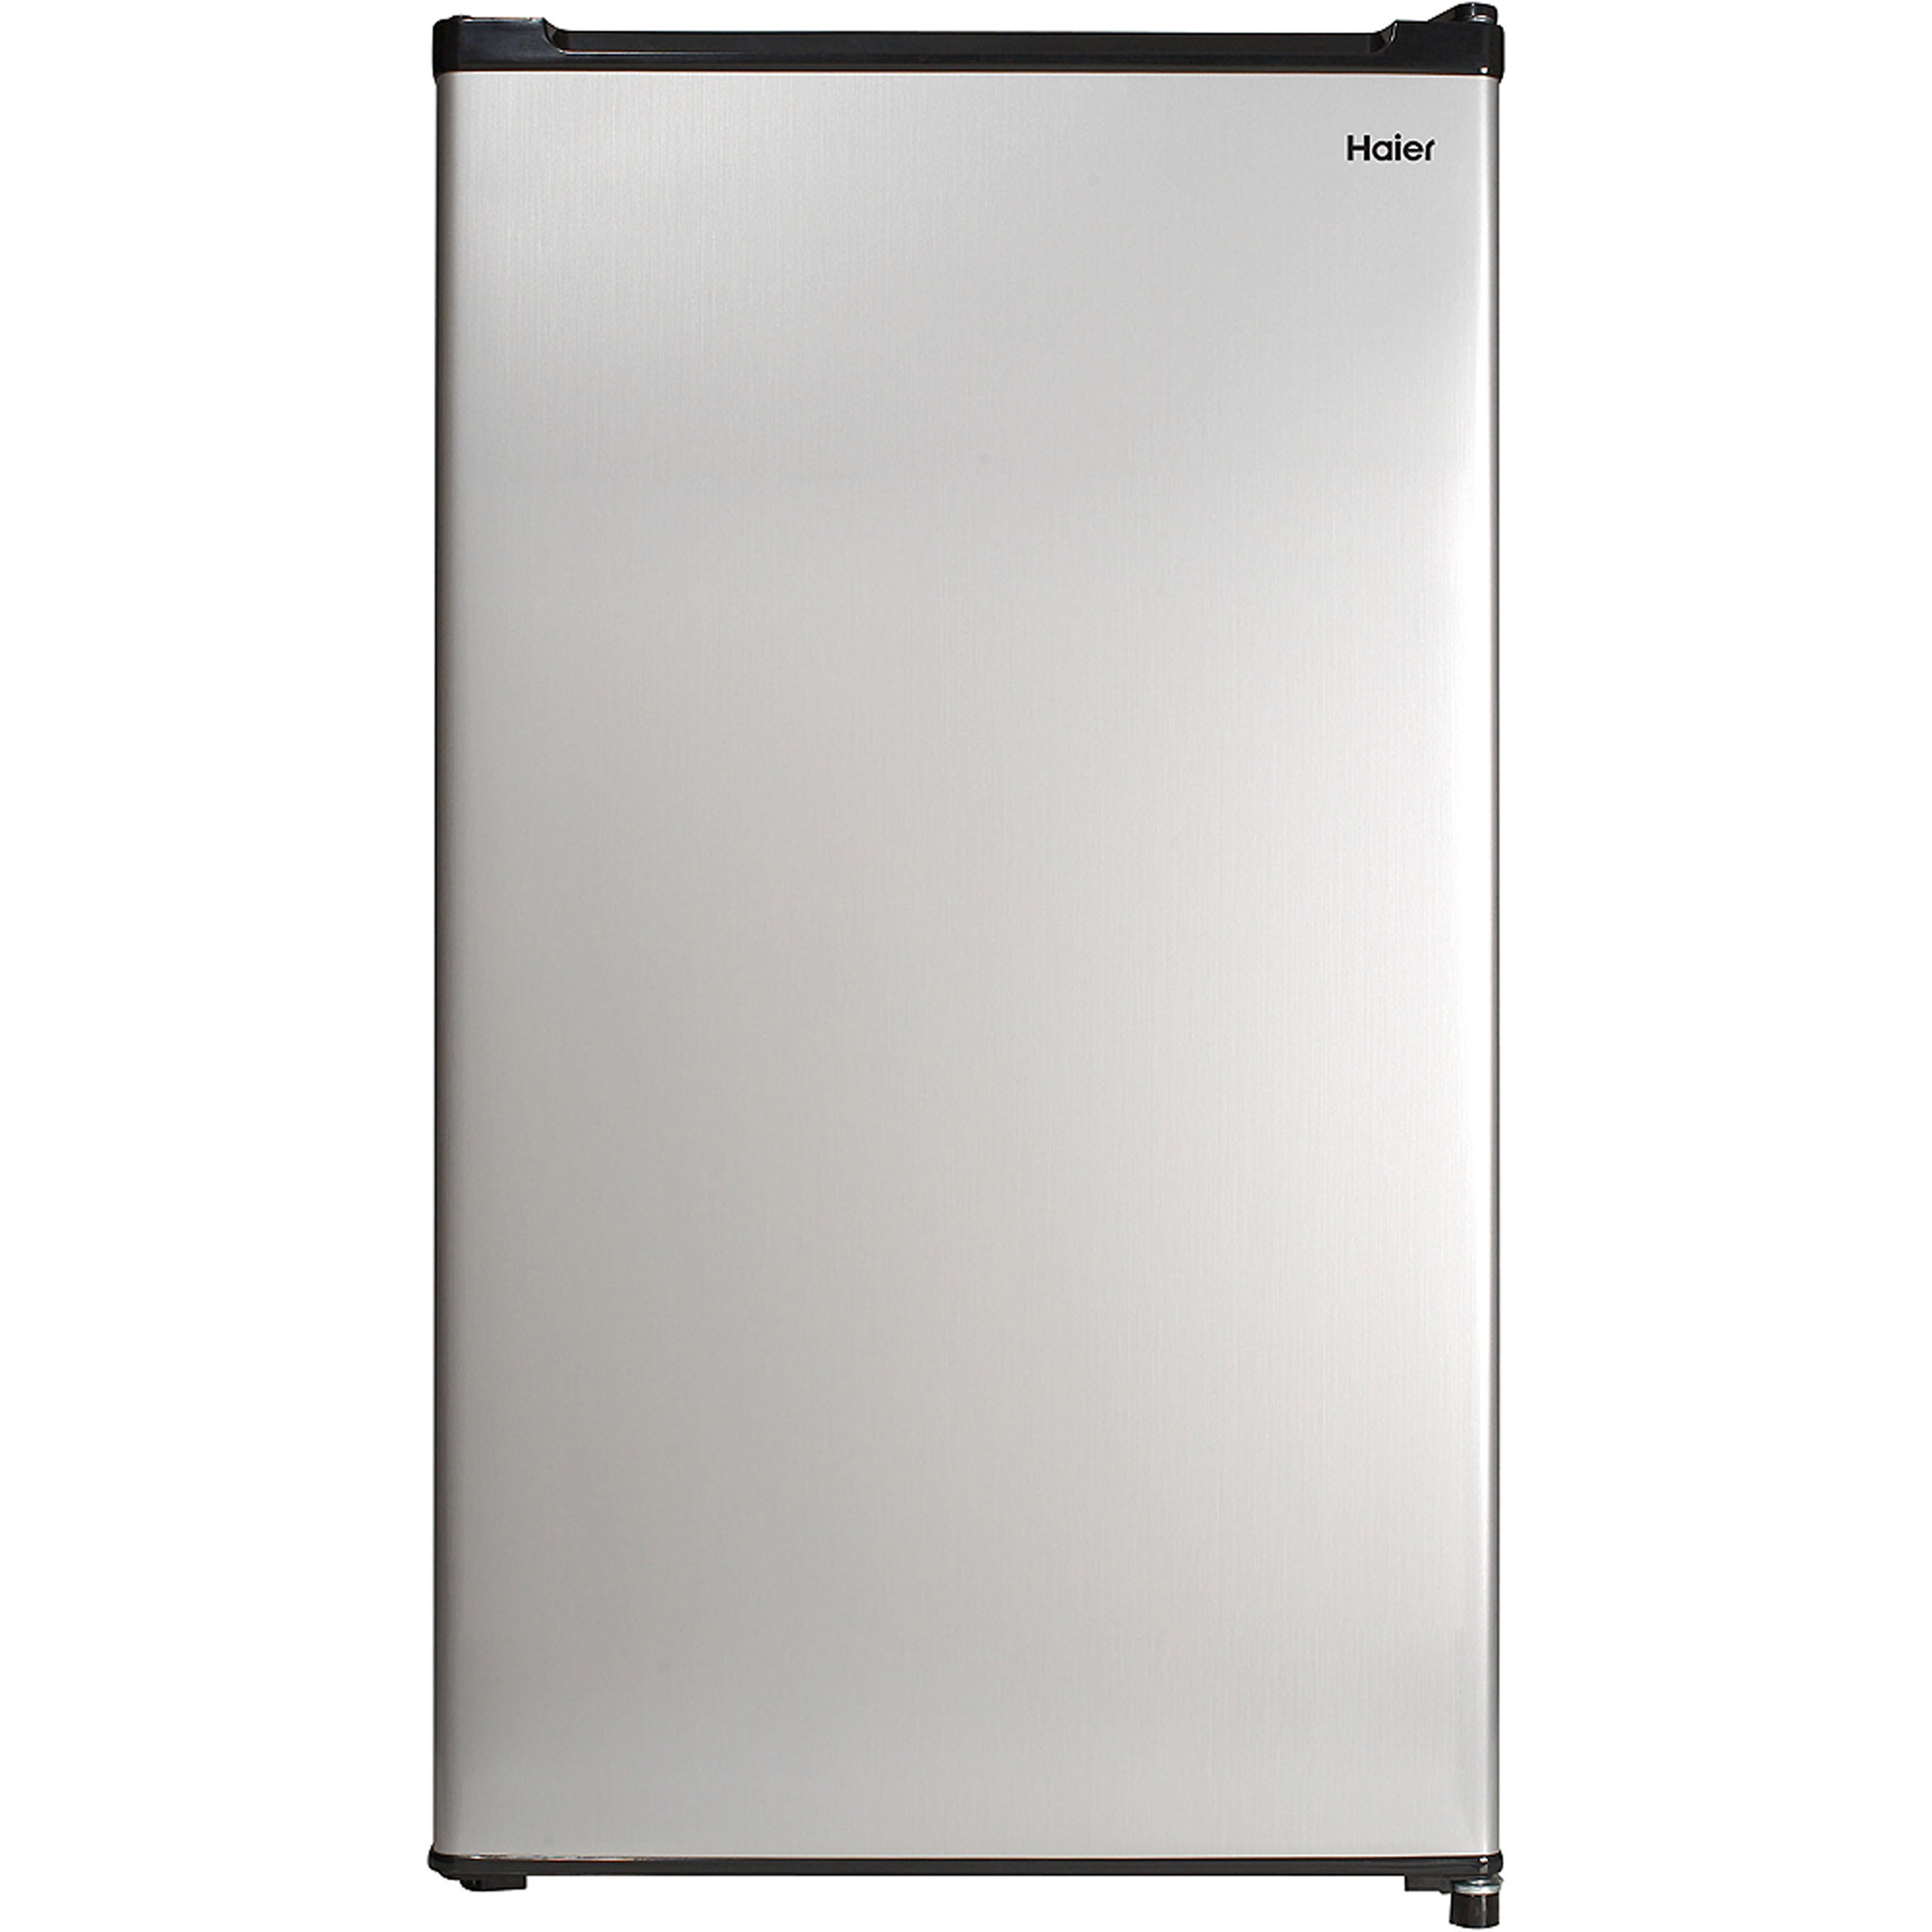 Haier 2.7 cu ft Refrigerator, Virtual Steel